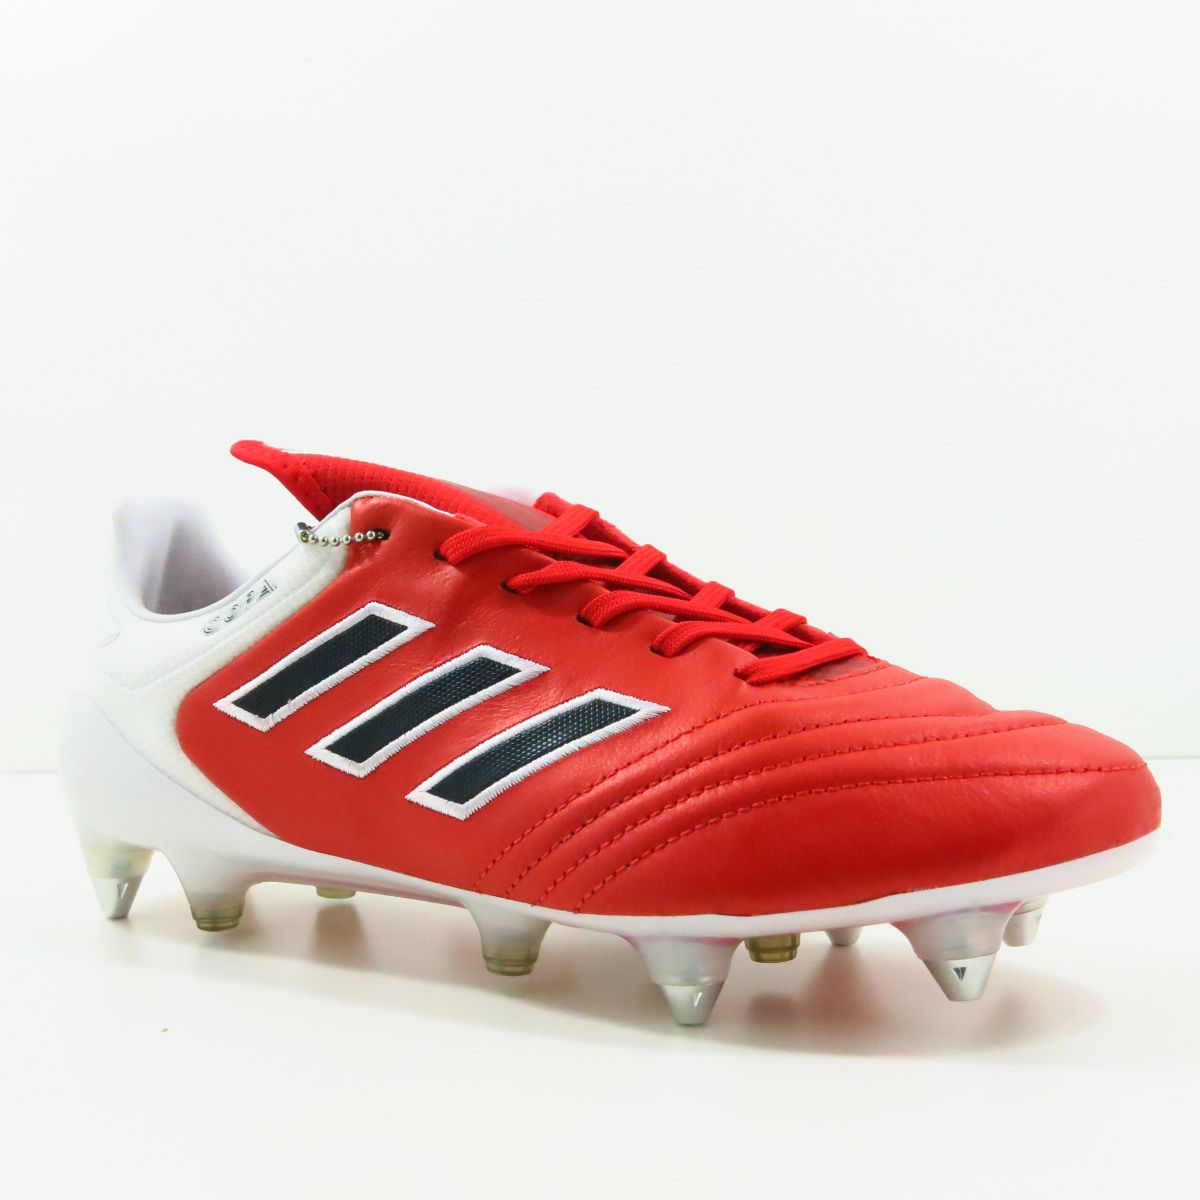 Chuteira Adidas Copa 17.1 SG Trava Mista - Couro de Canguru